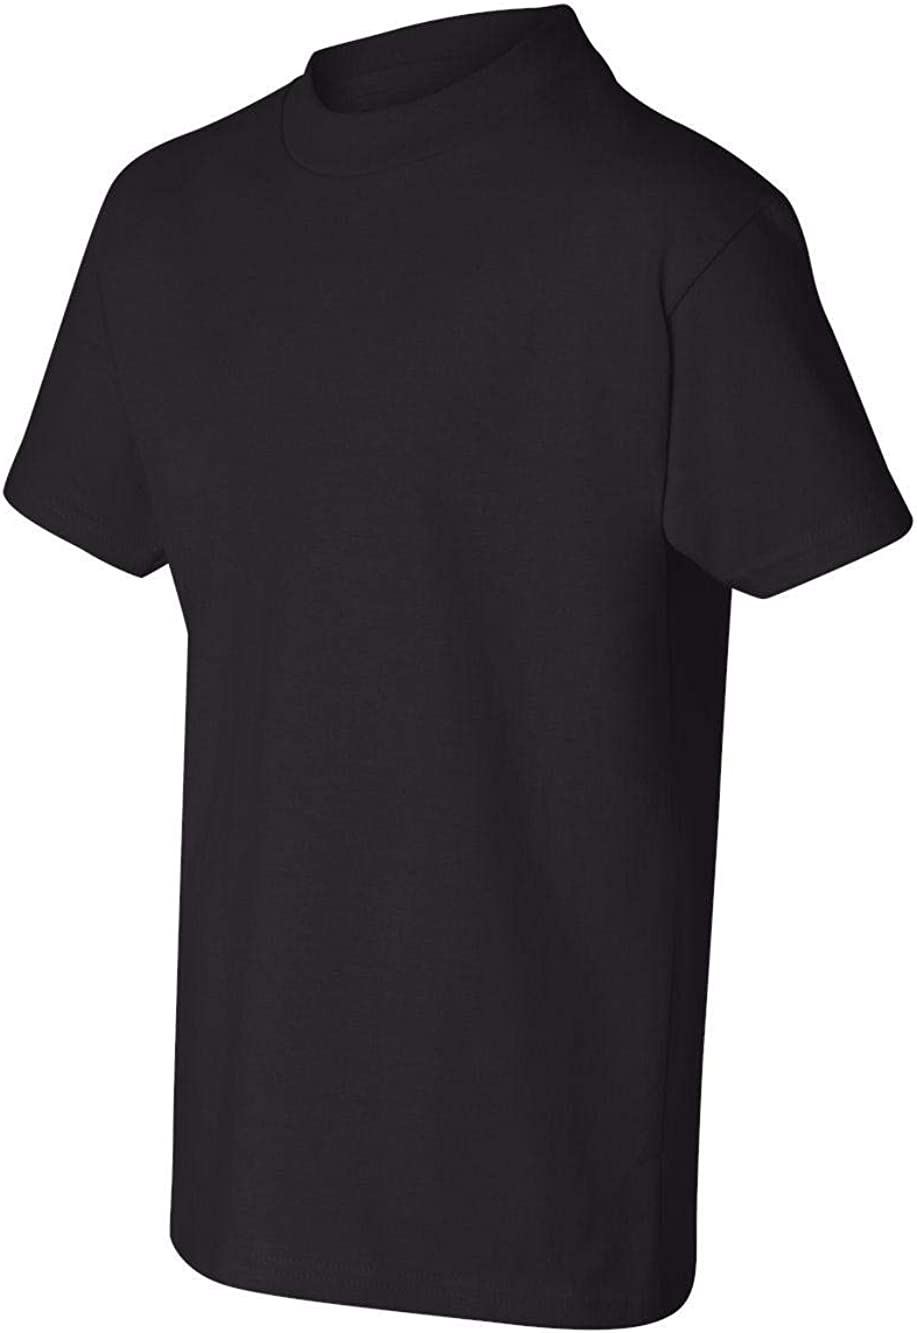 Hanes - Tagless Youth Short Sleeve T-Shirt - 5450